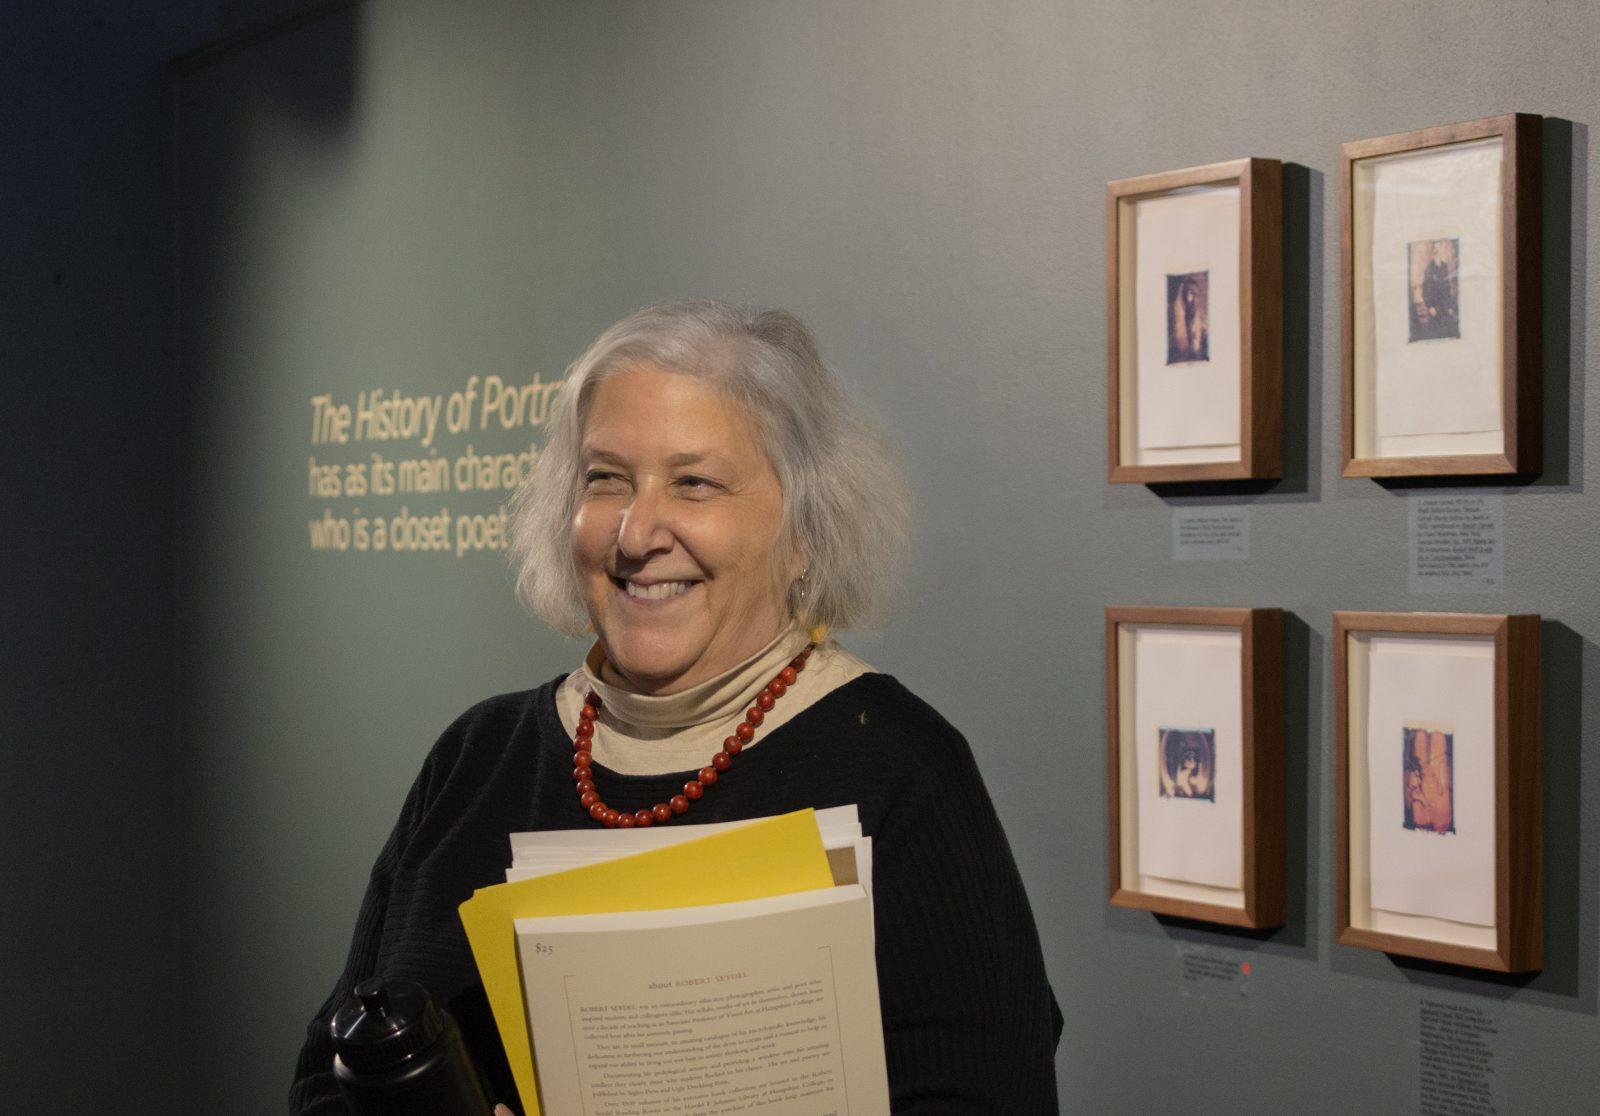 Sura Levine smiling in front of Seydel artworks